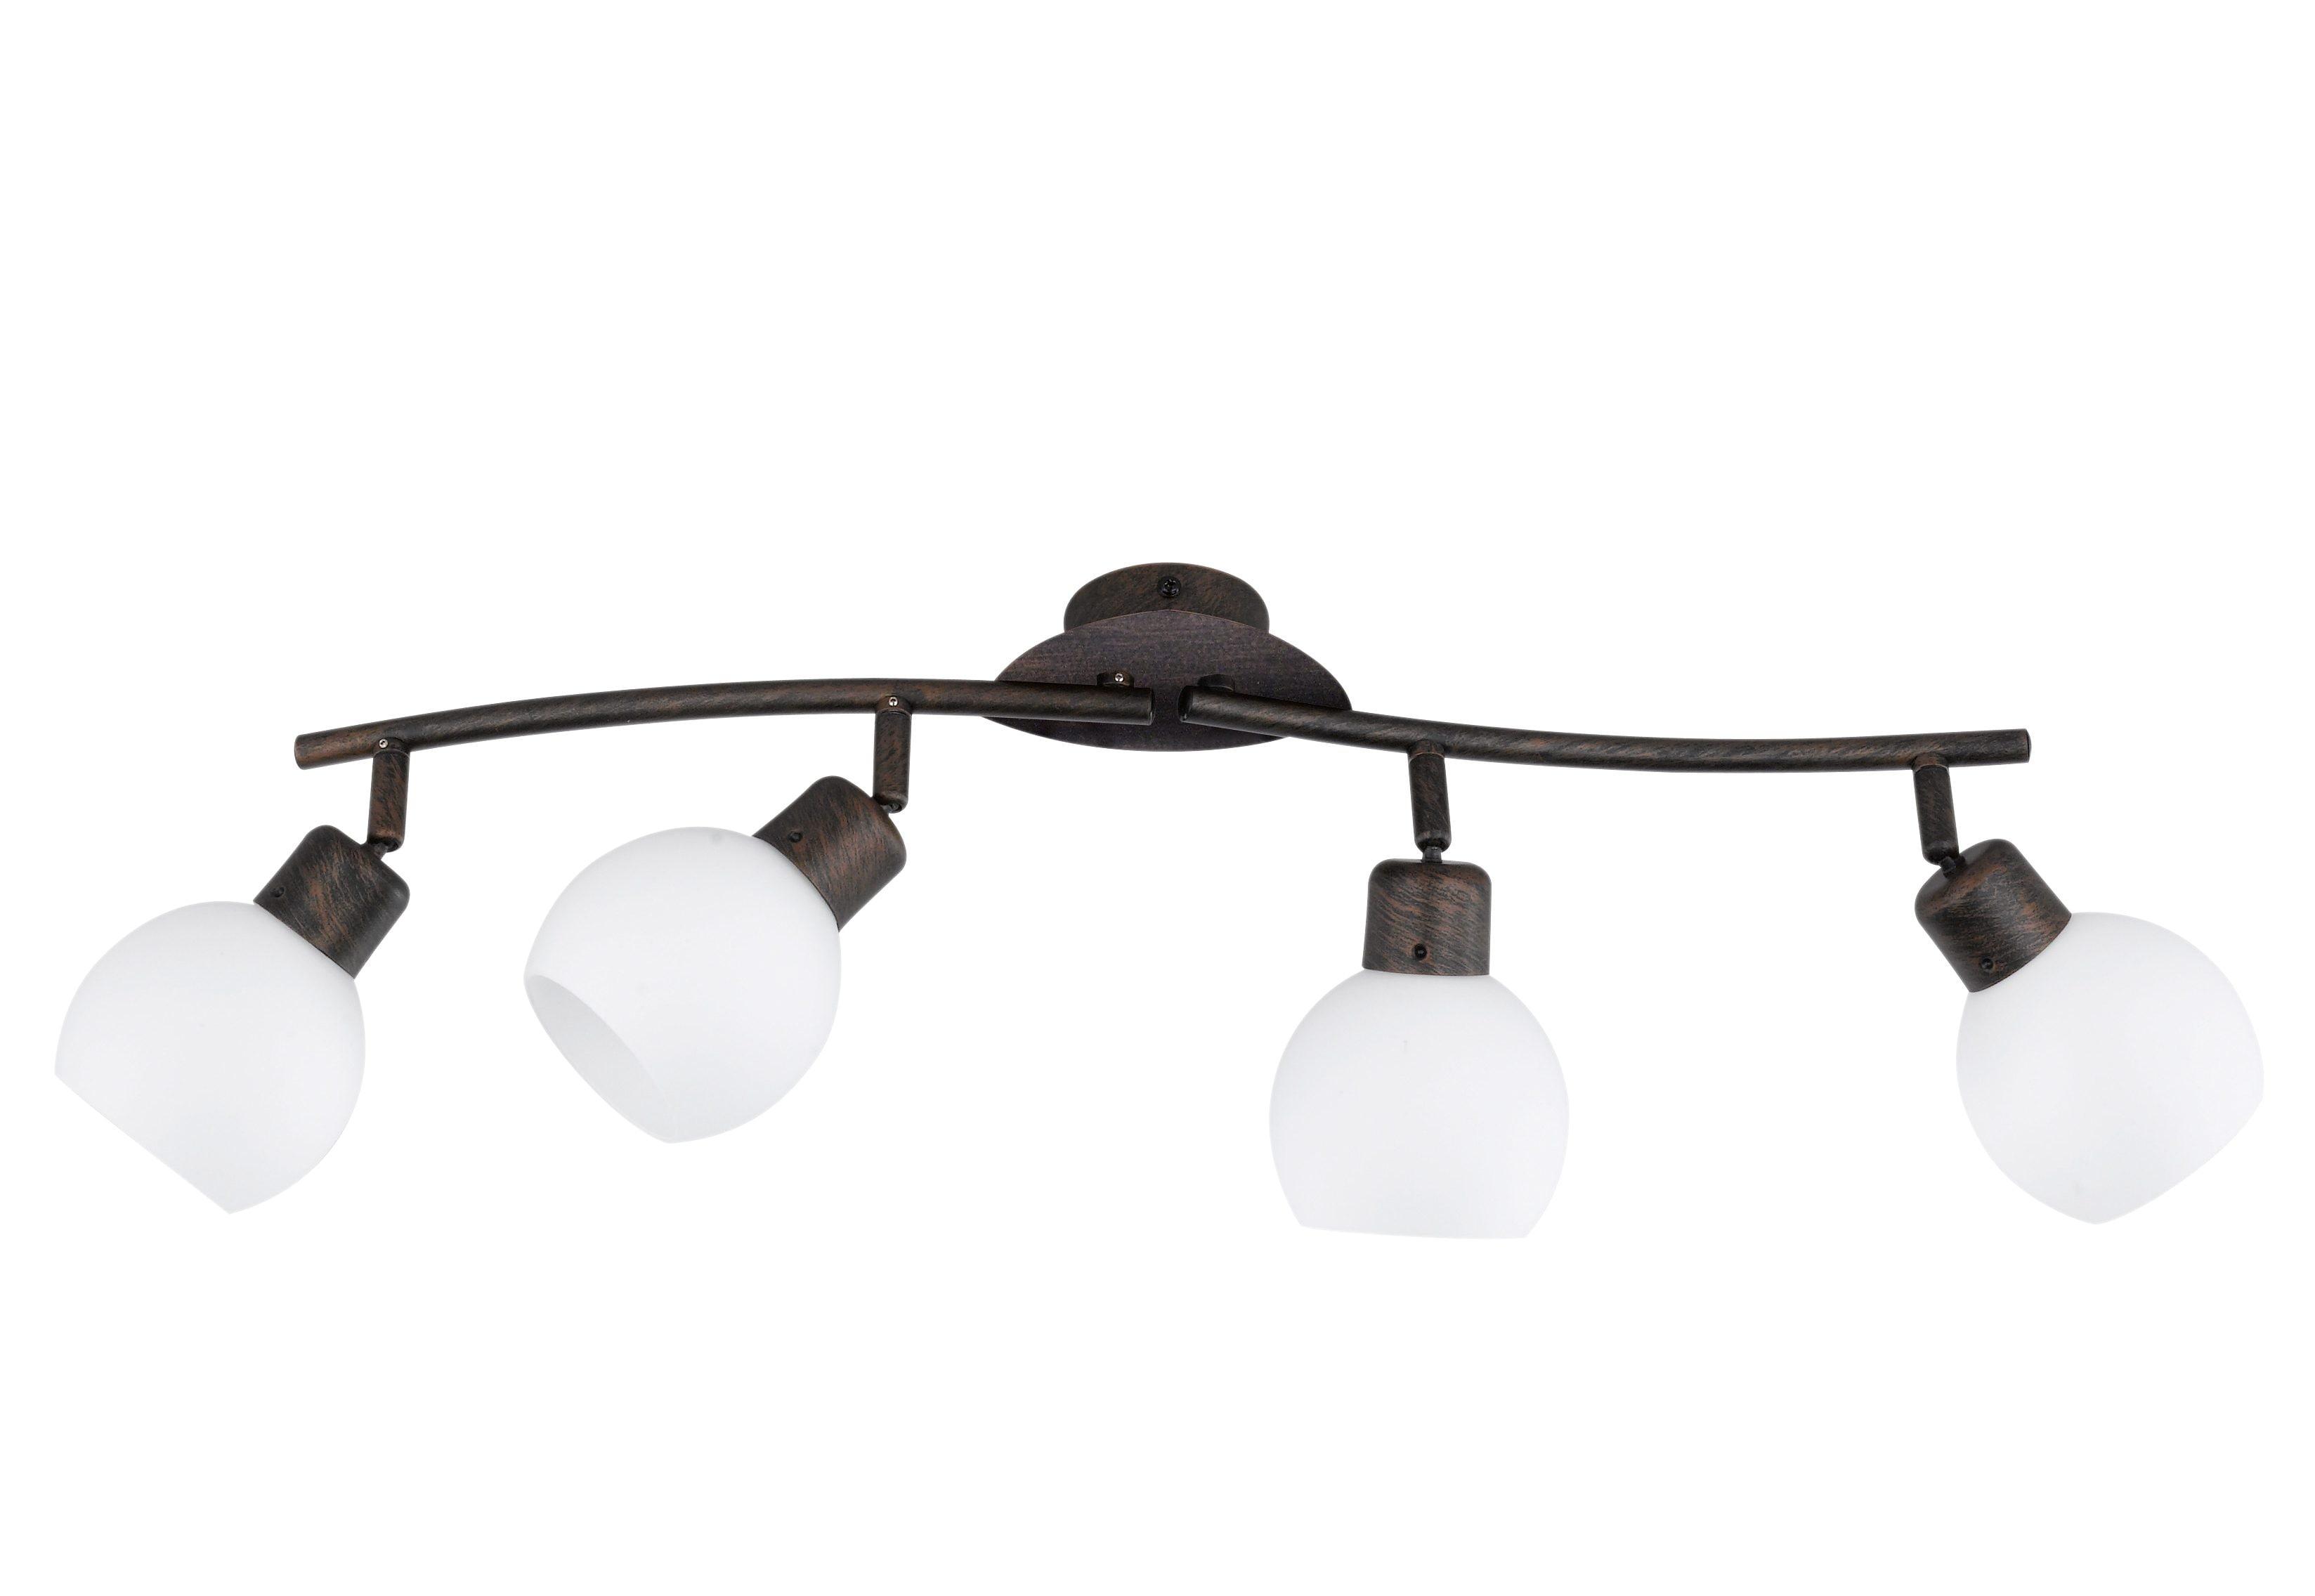 TRIO Leuchten LED Deckenstrahler, E14, LED Deckenleuchte, LED Deckenlampe